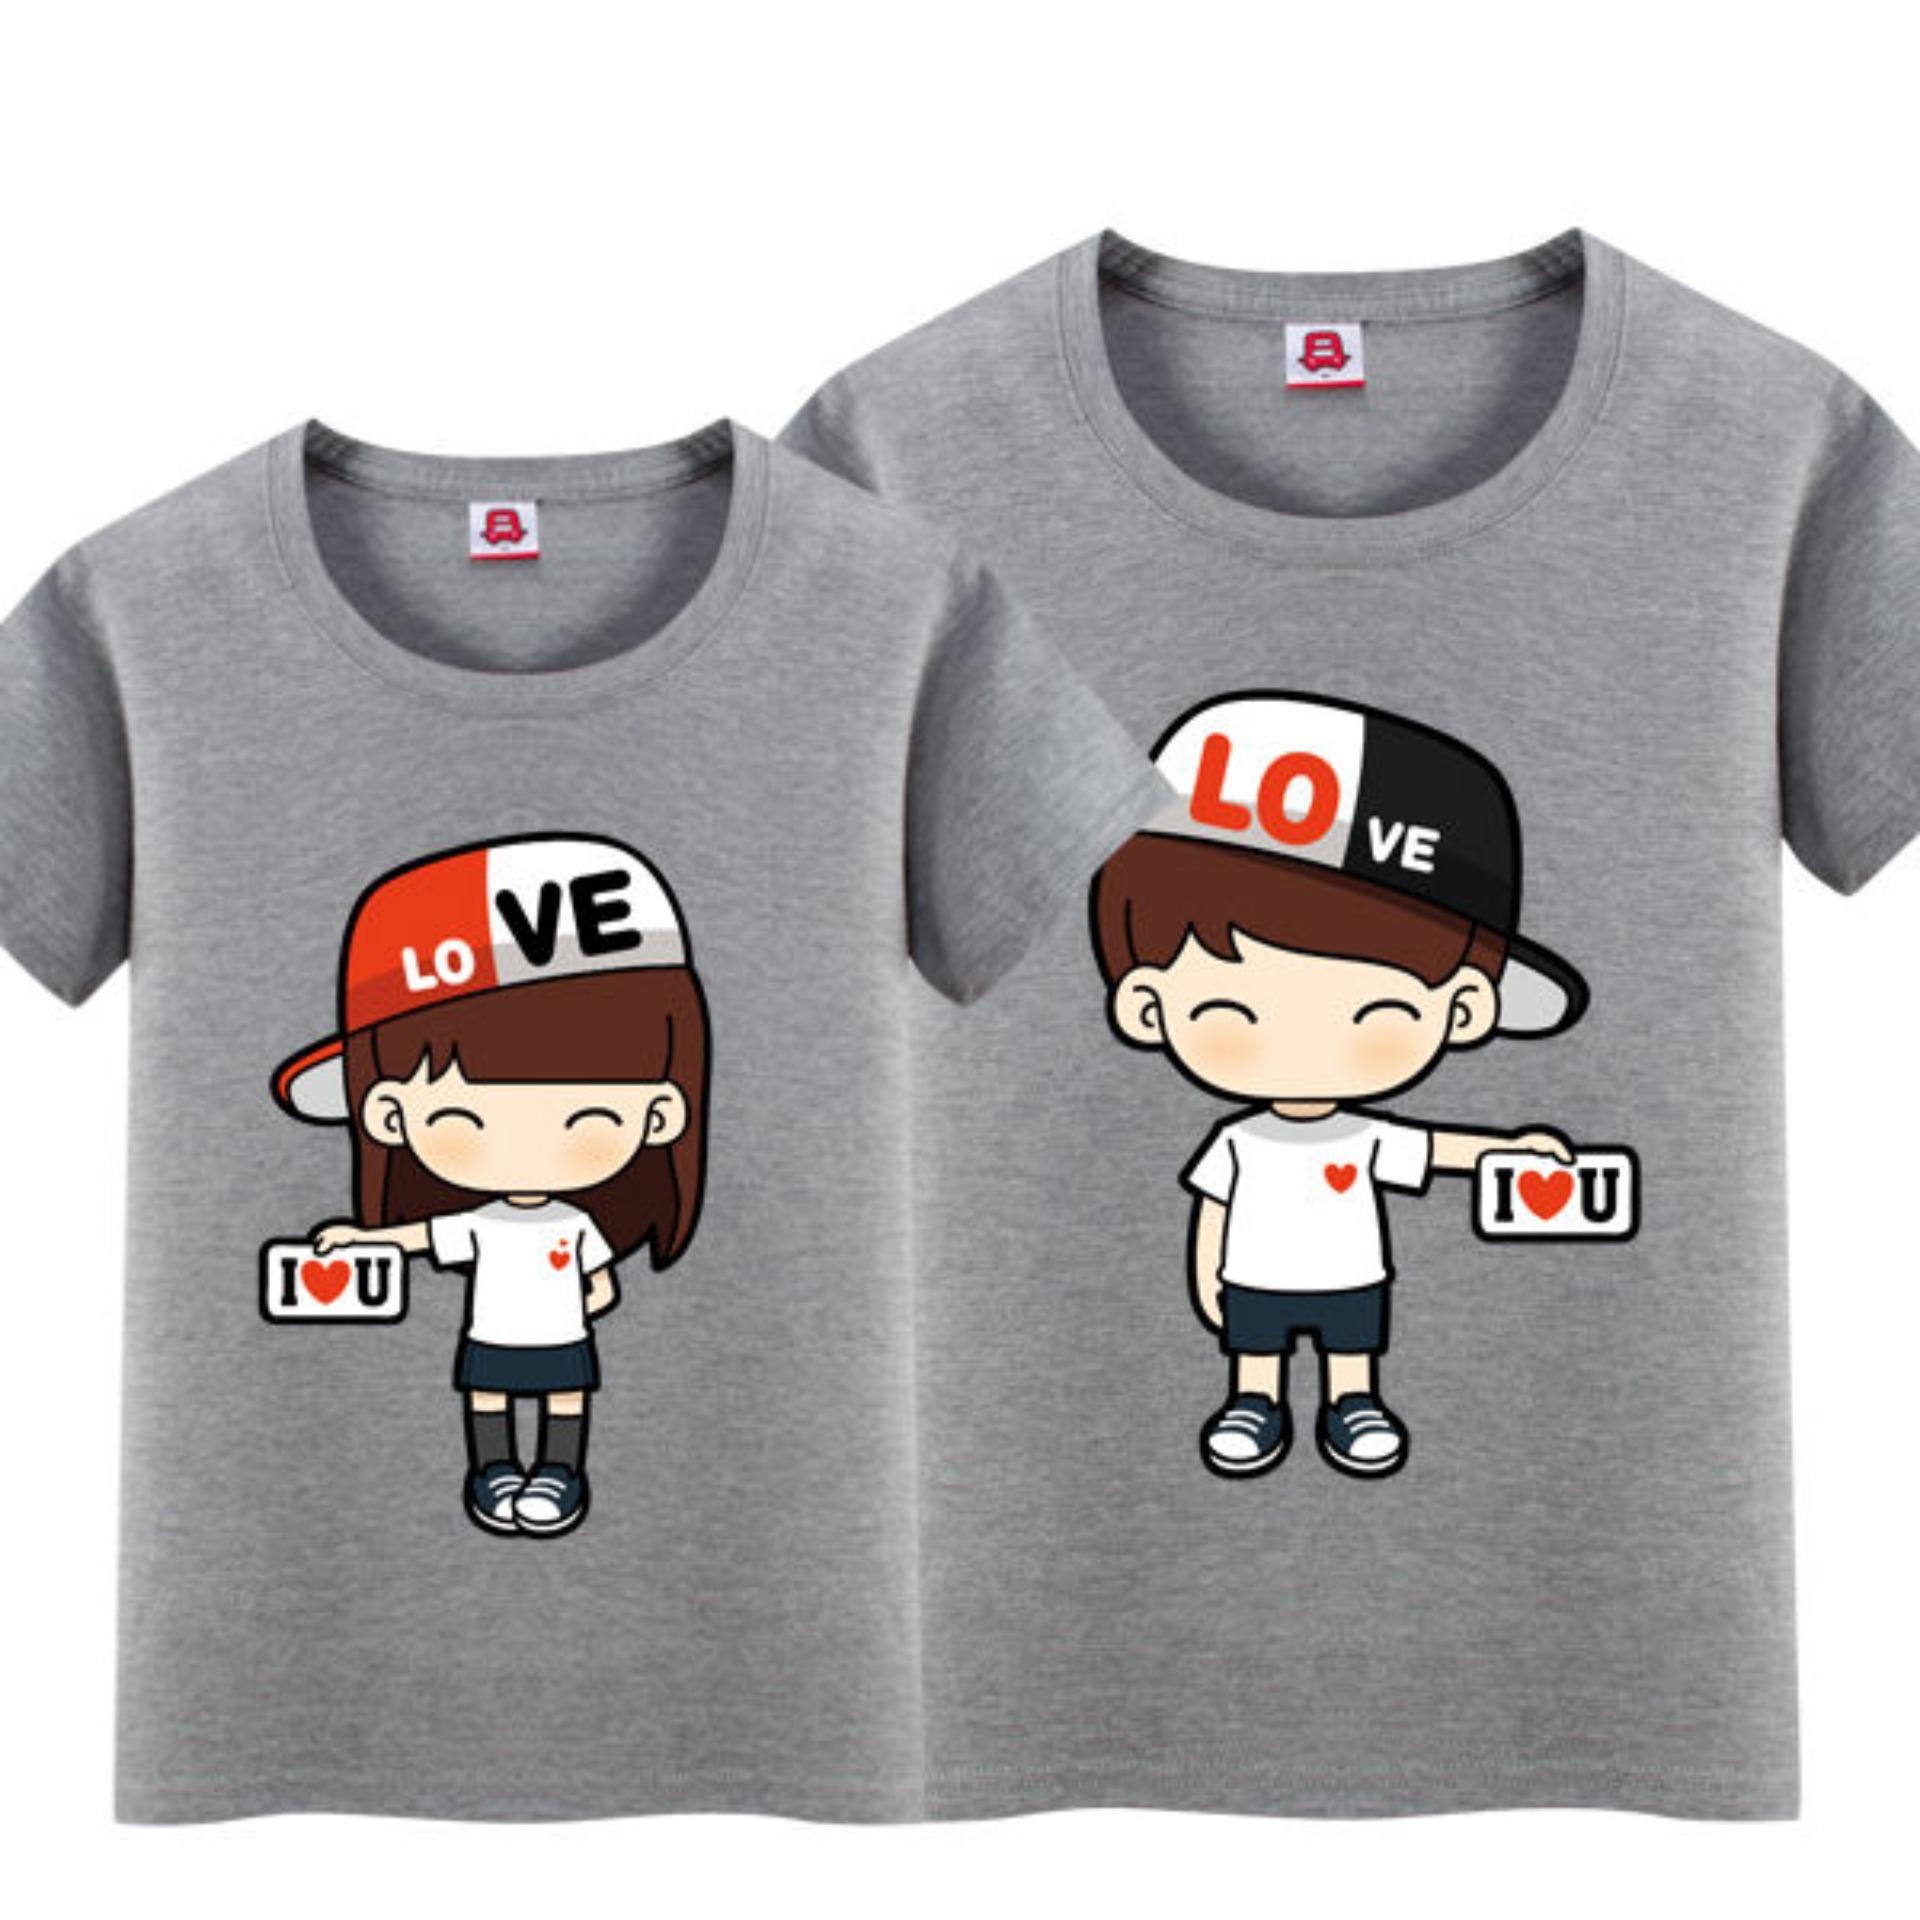 JC - Kaos Couple Topi Love Model Terbaru / Tshit Couple / Baju Pasangan